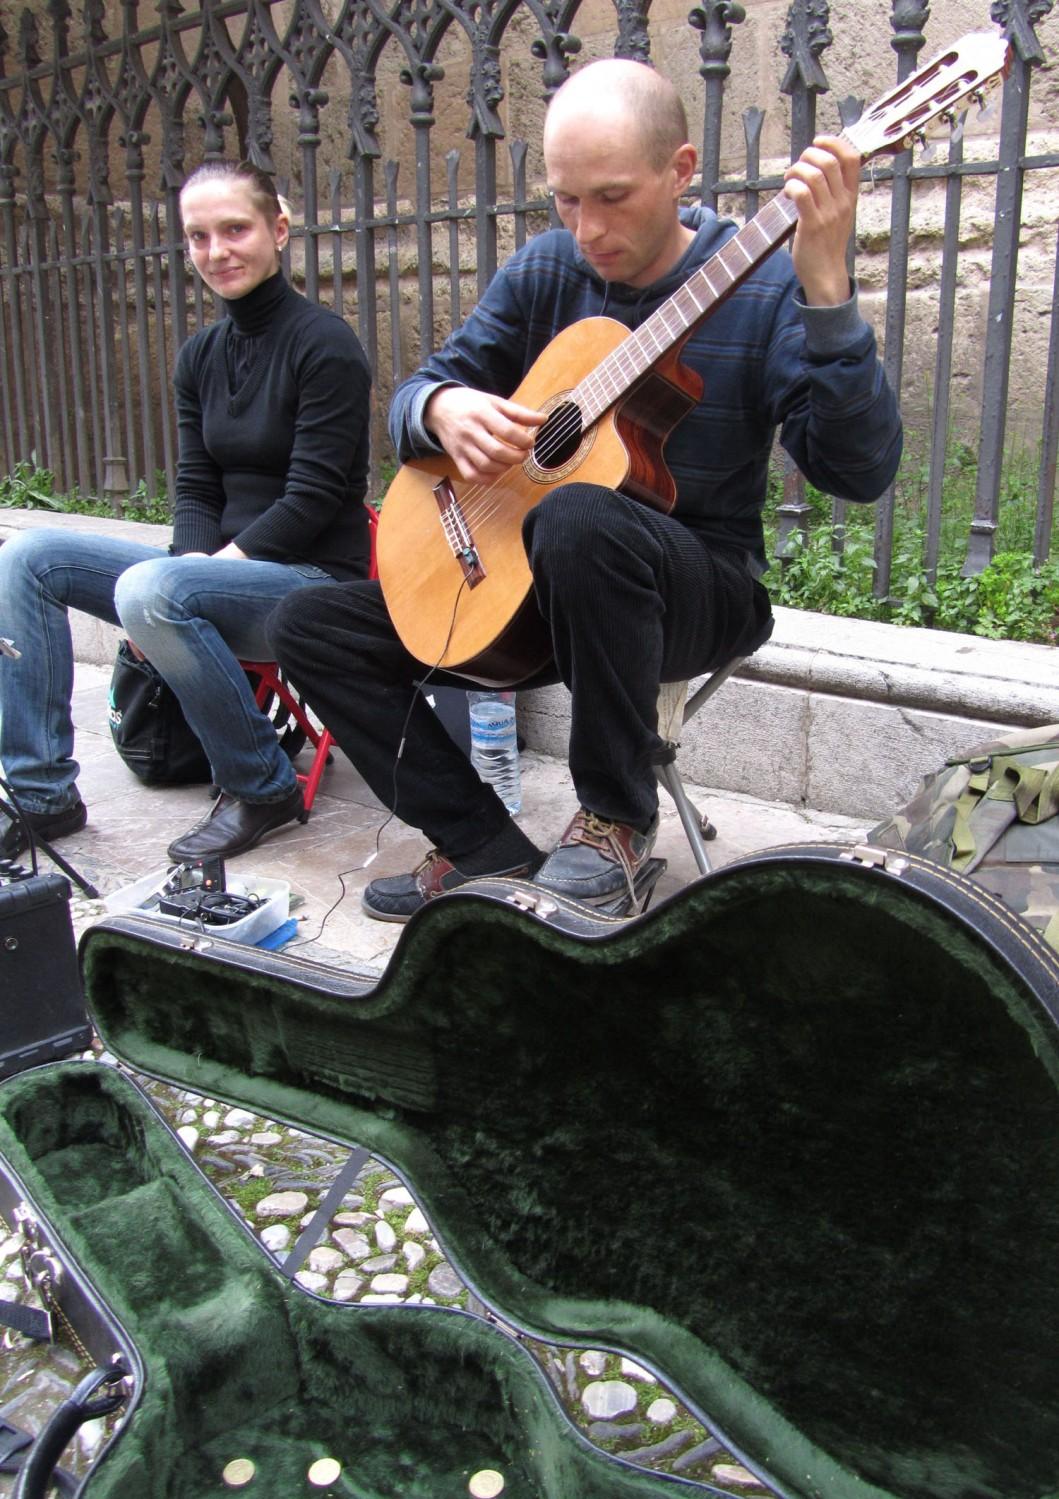 Spain-Granada-Musicians